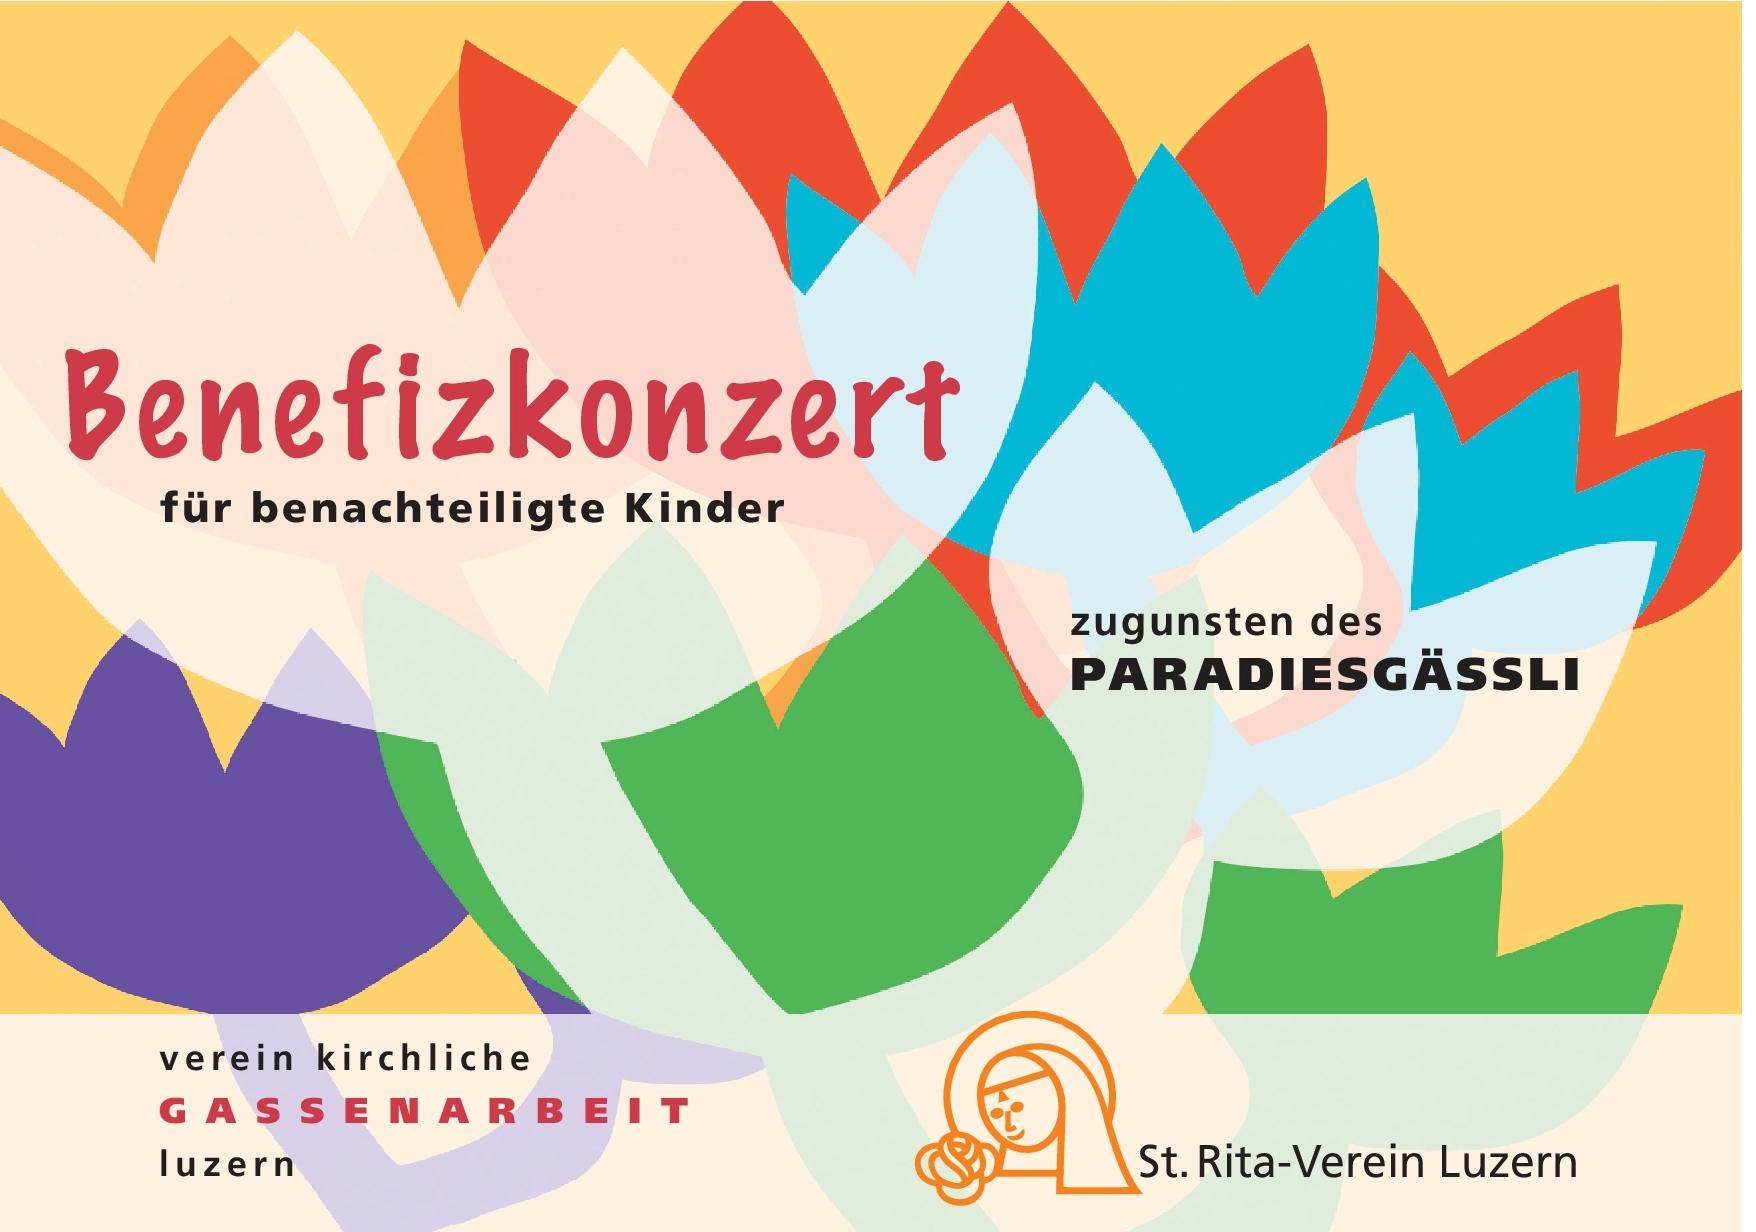 Benefizkonzert Luzern_duopoli_Franziskanerkirche-001